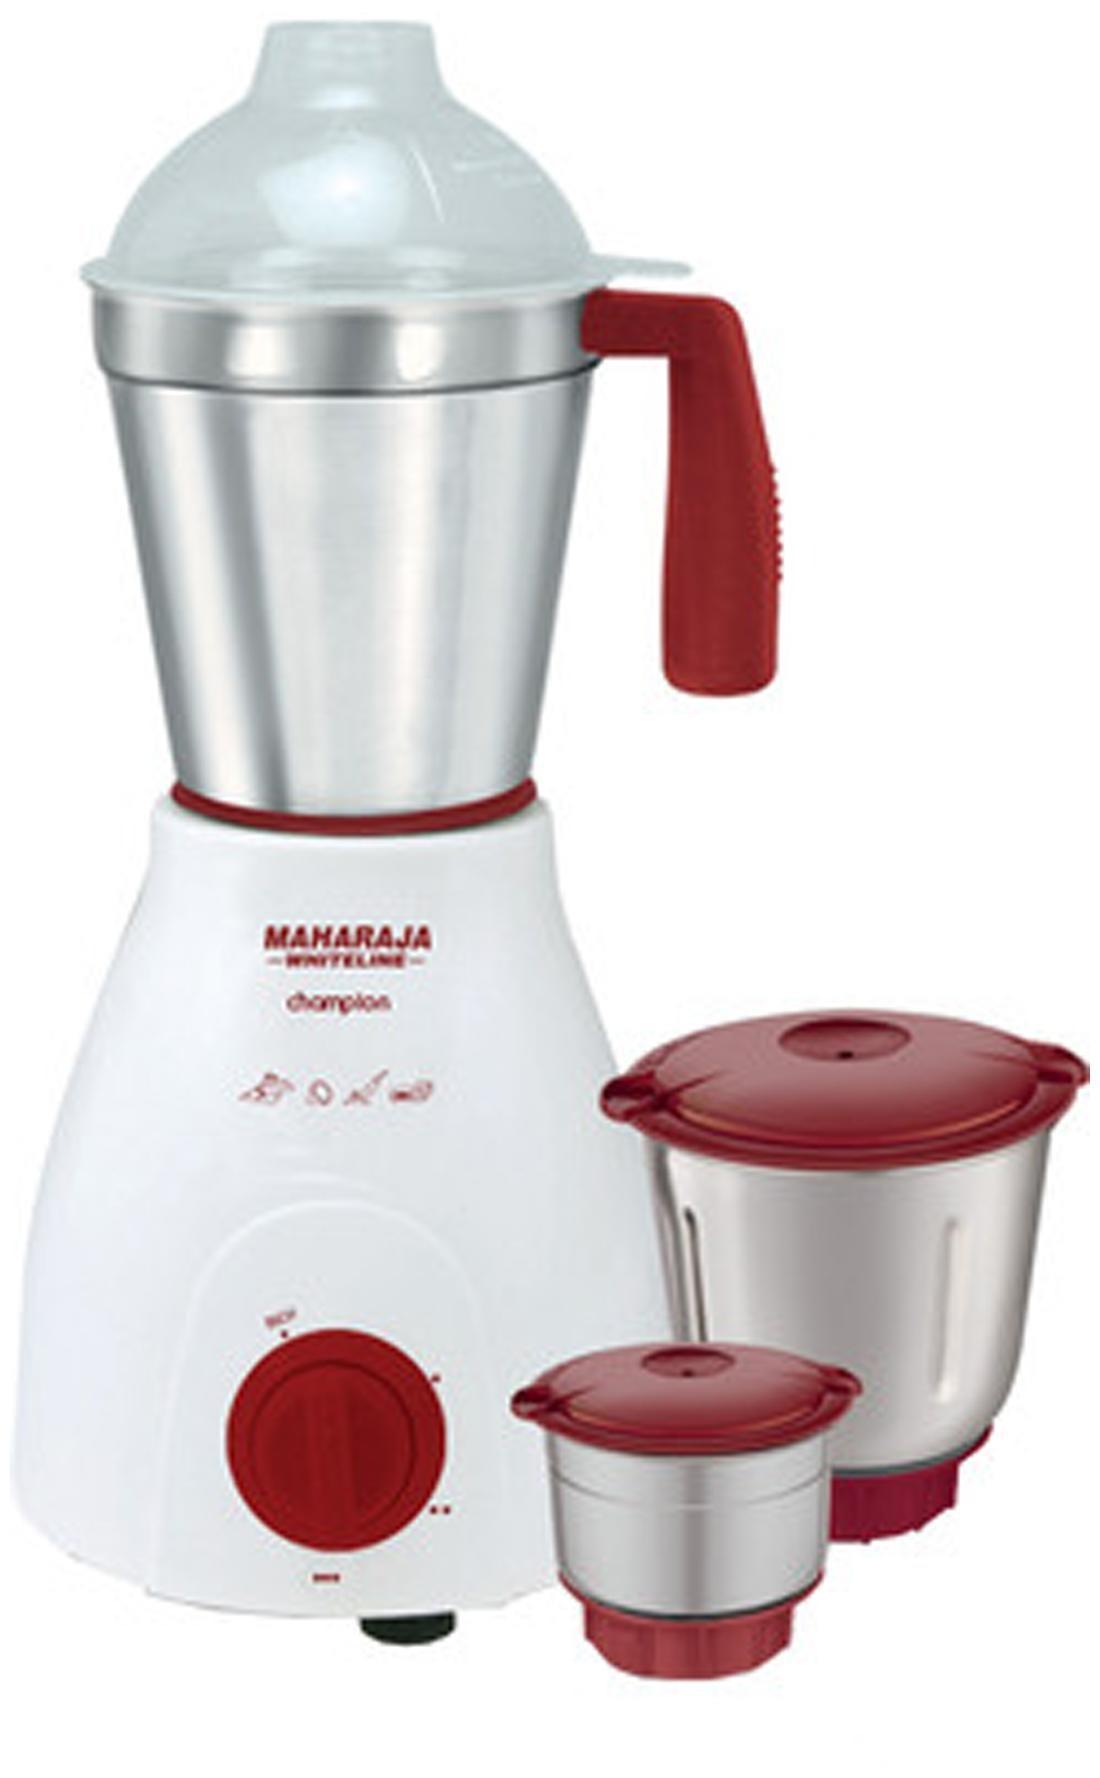 Maharaja Whiteline Champion MX-121 500 W Mixer Grinder (White & Red/3 Jars)